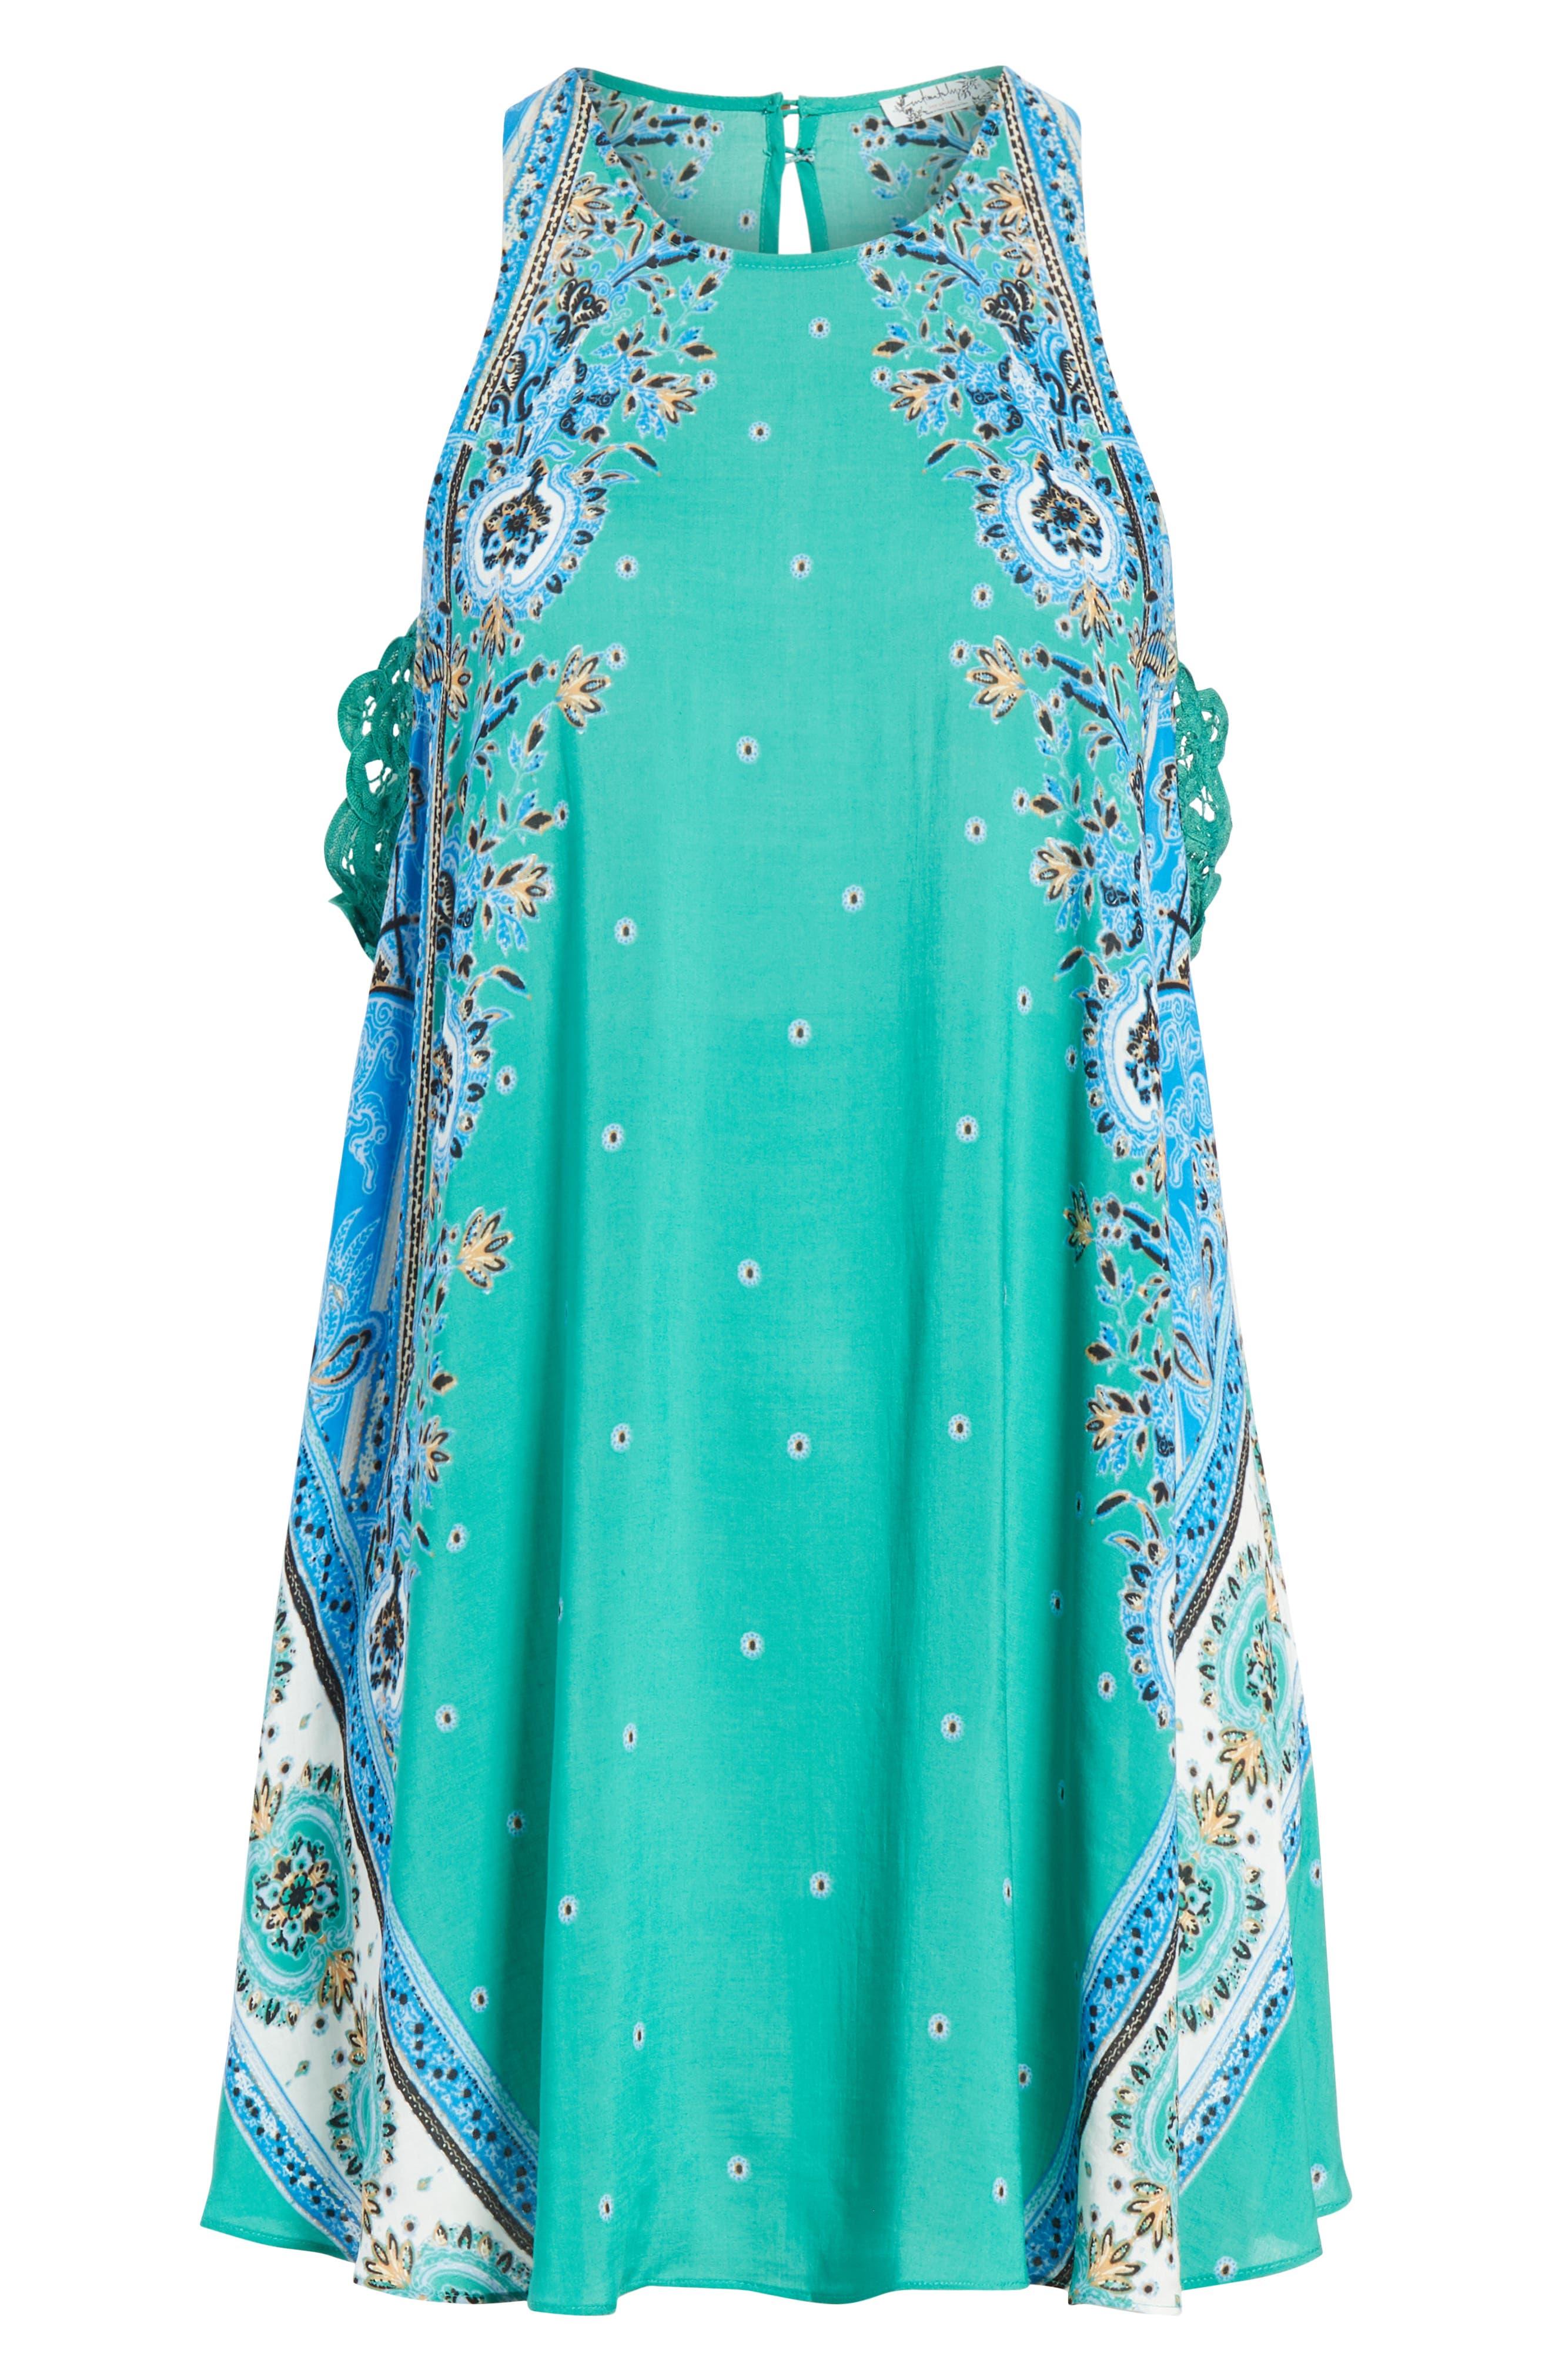 Darjeeling Print Minidress,                             Alternate thumbnail 6, color,                             Green